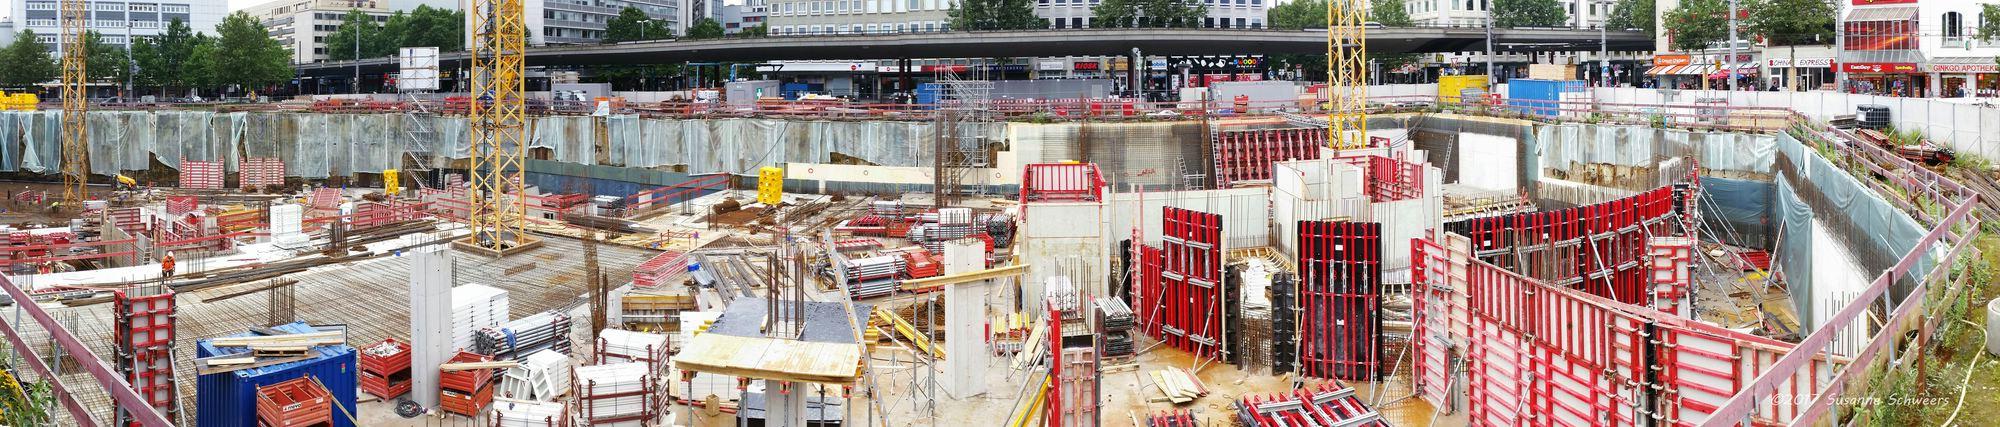 Baustelle Bahnhofsplatz 151